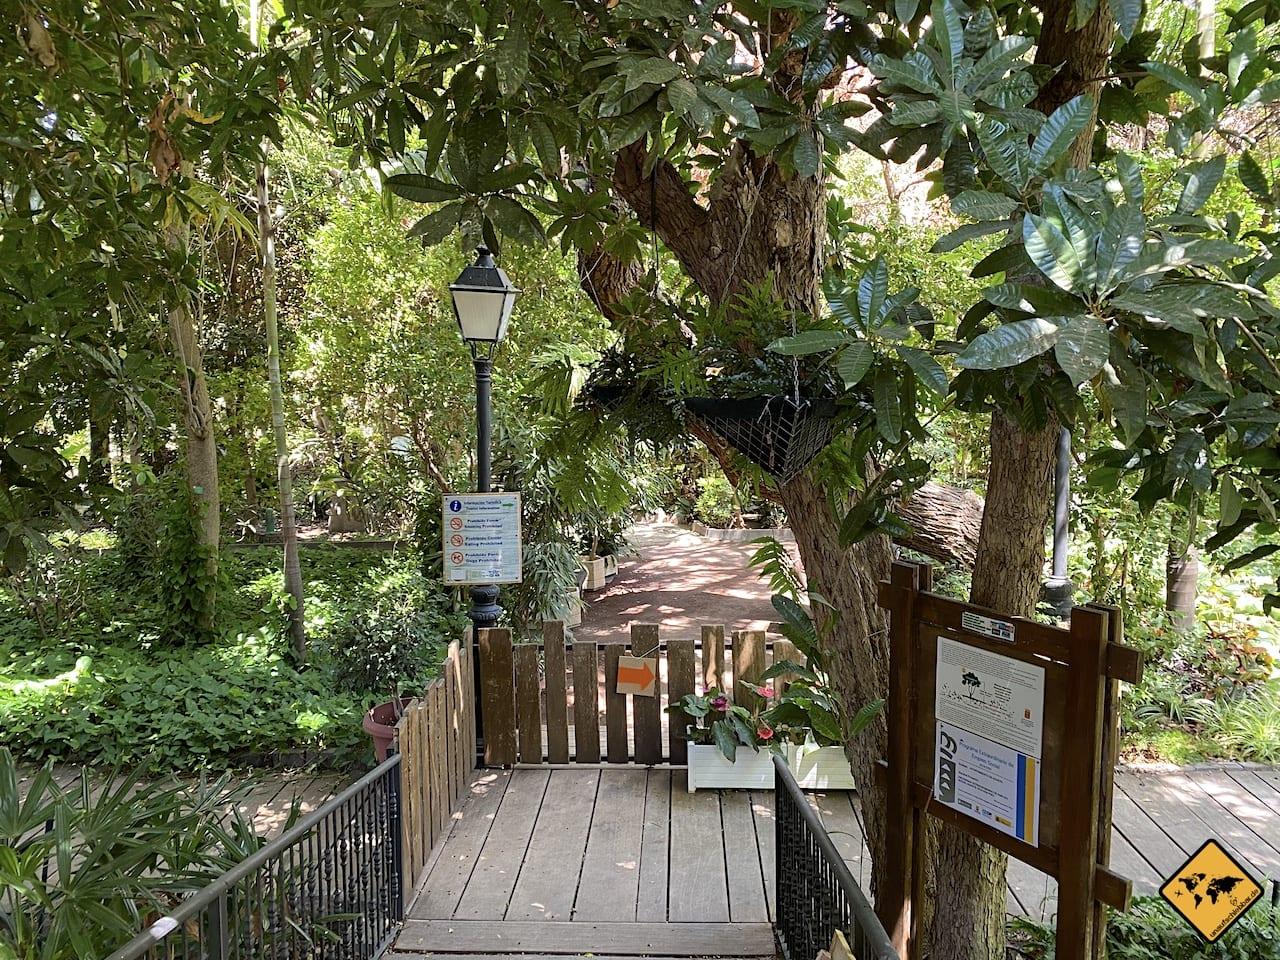 Huerto de Las Flores botanischer Garten Agaete